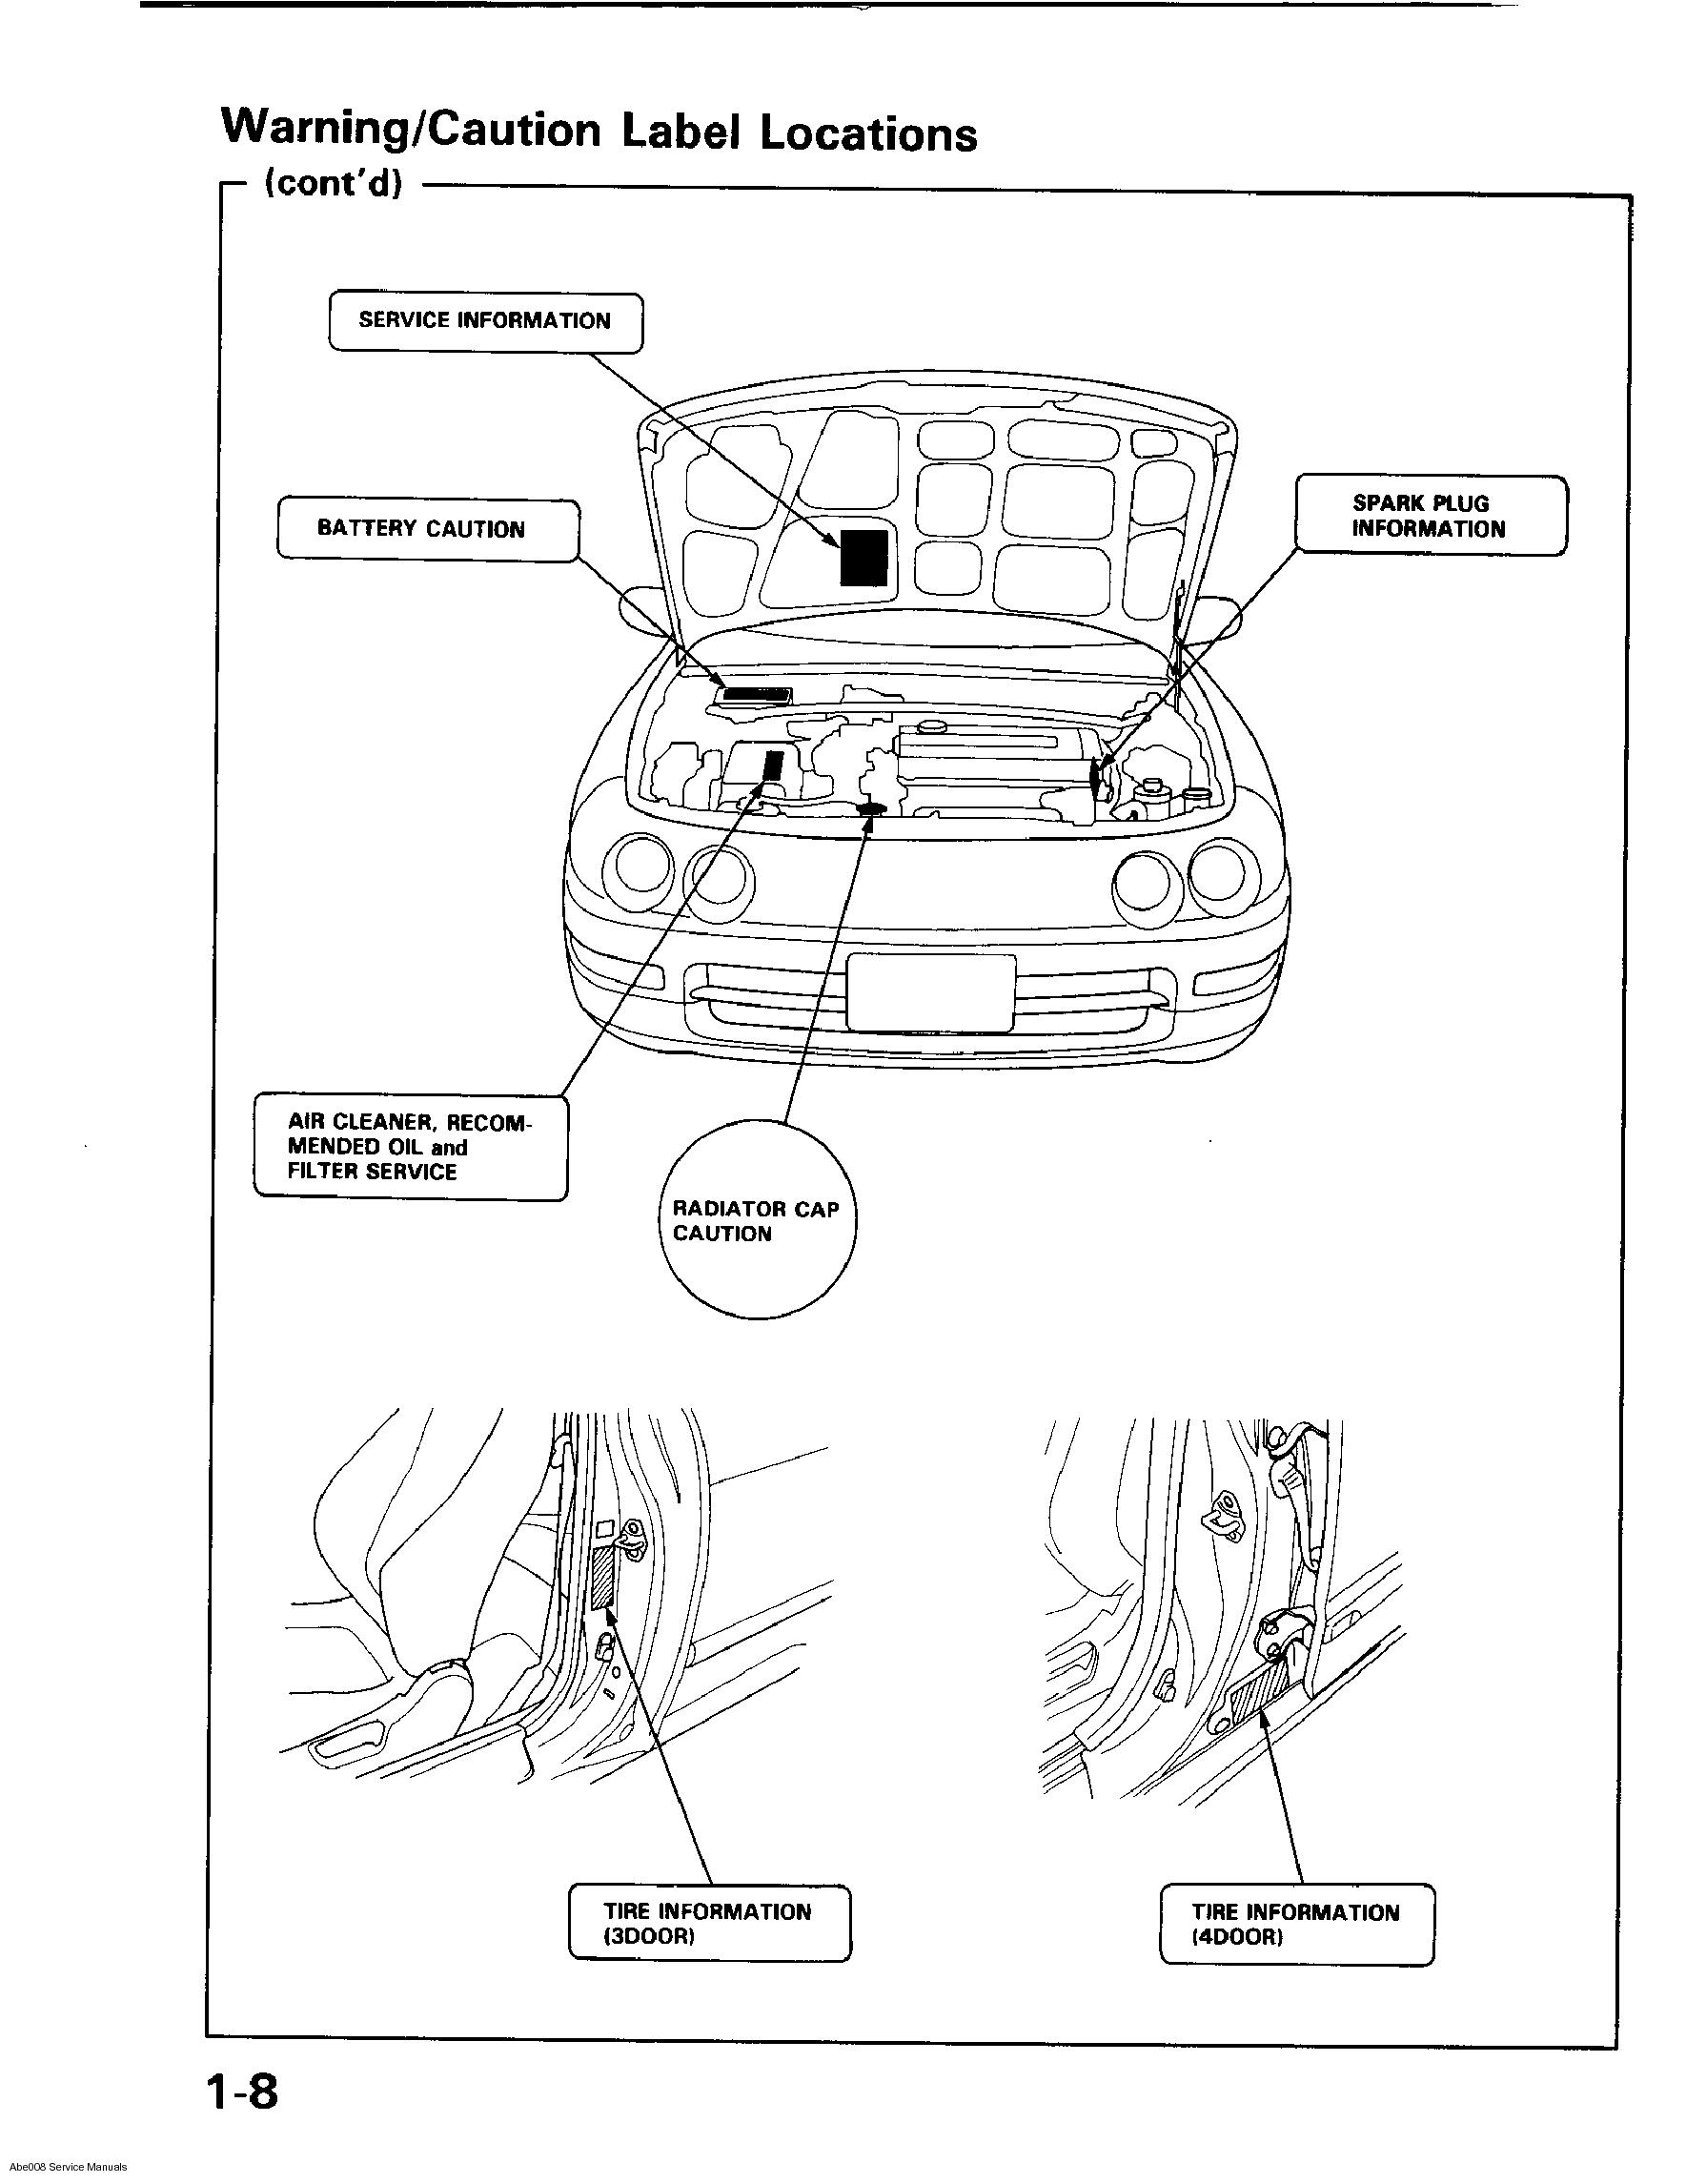 ... Acura Integra 1994 - 2000 Service Manual ...